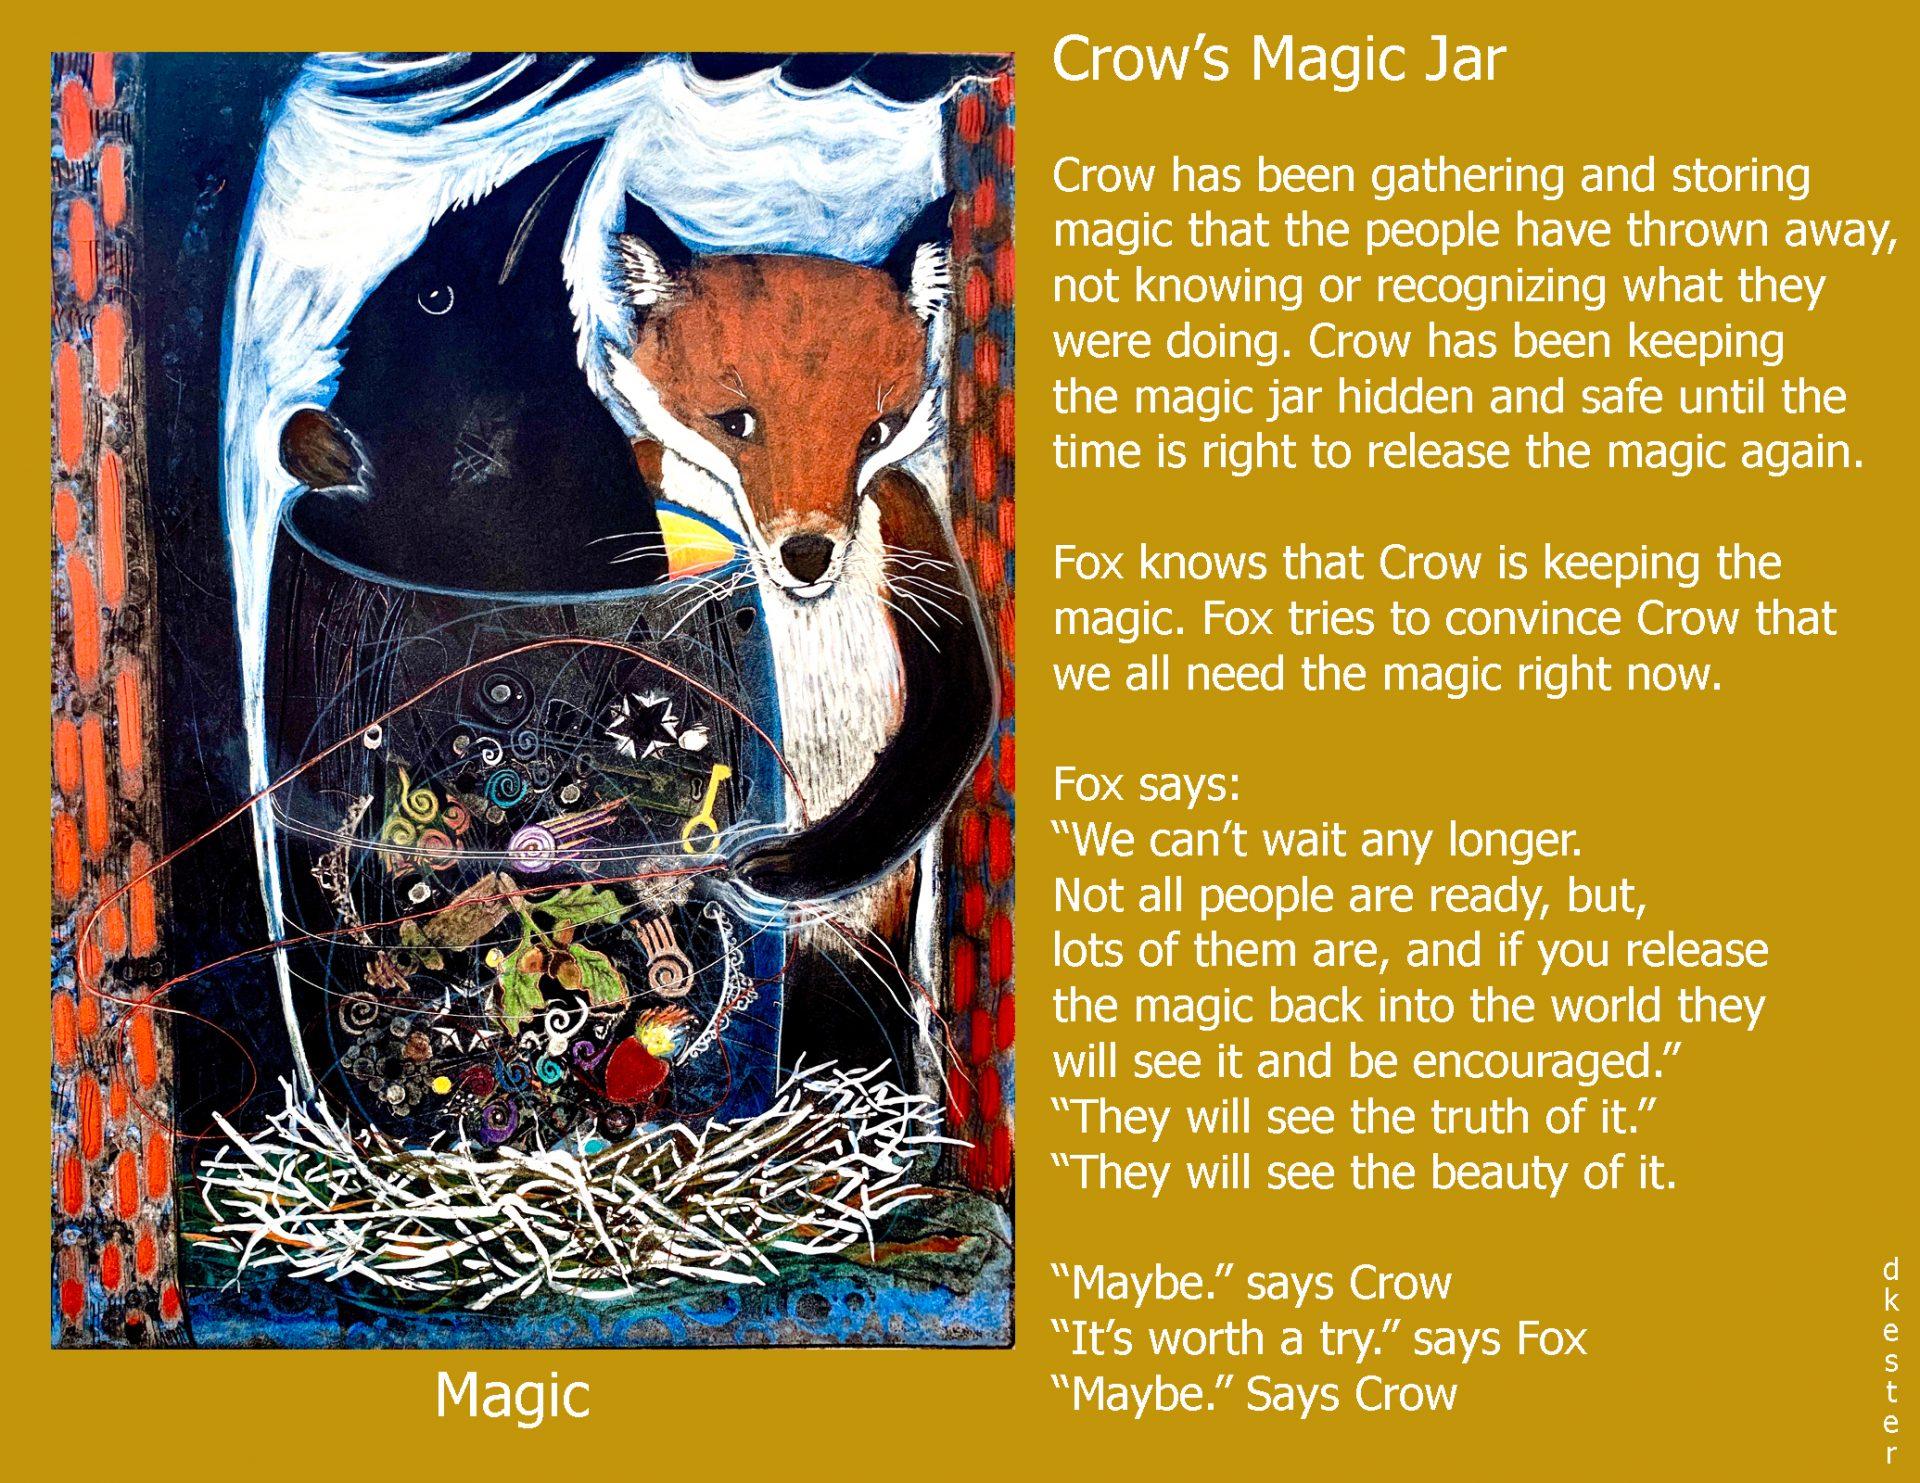 Crow's Magic Jar #63